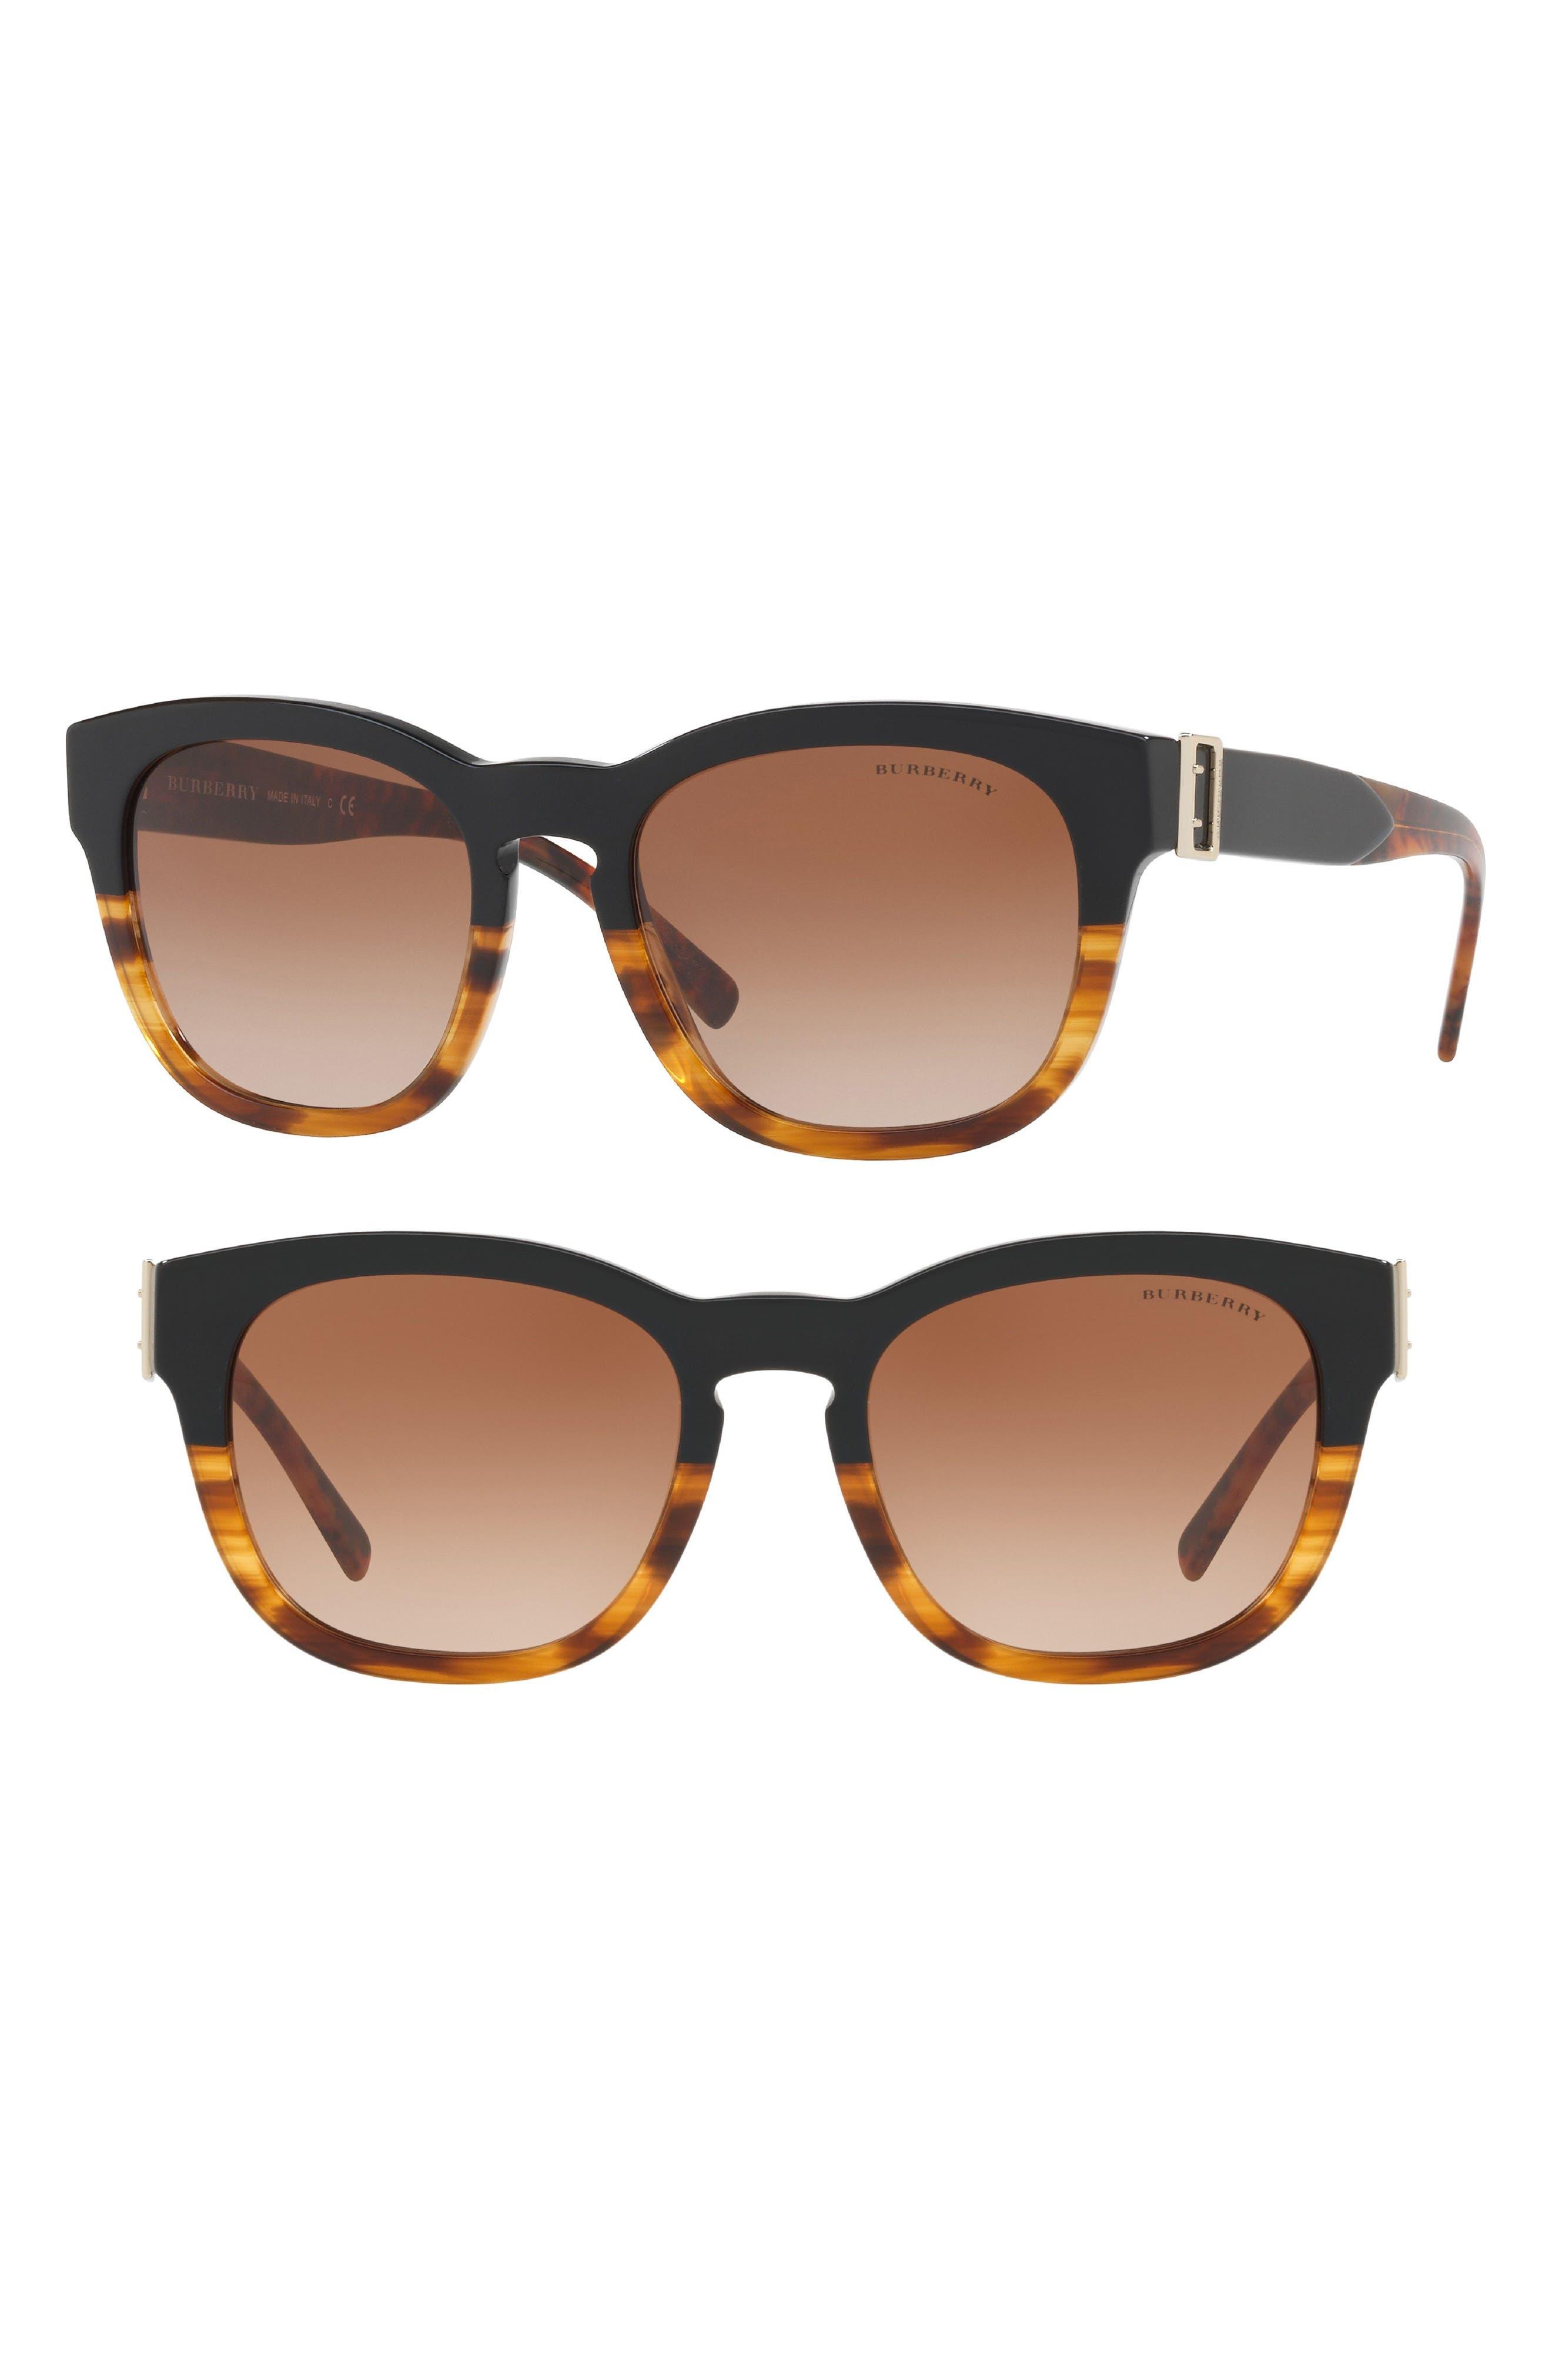 54mm Cat Eye Sunglasses,                         Main,                         color,